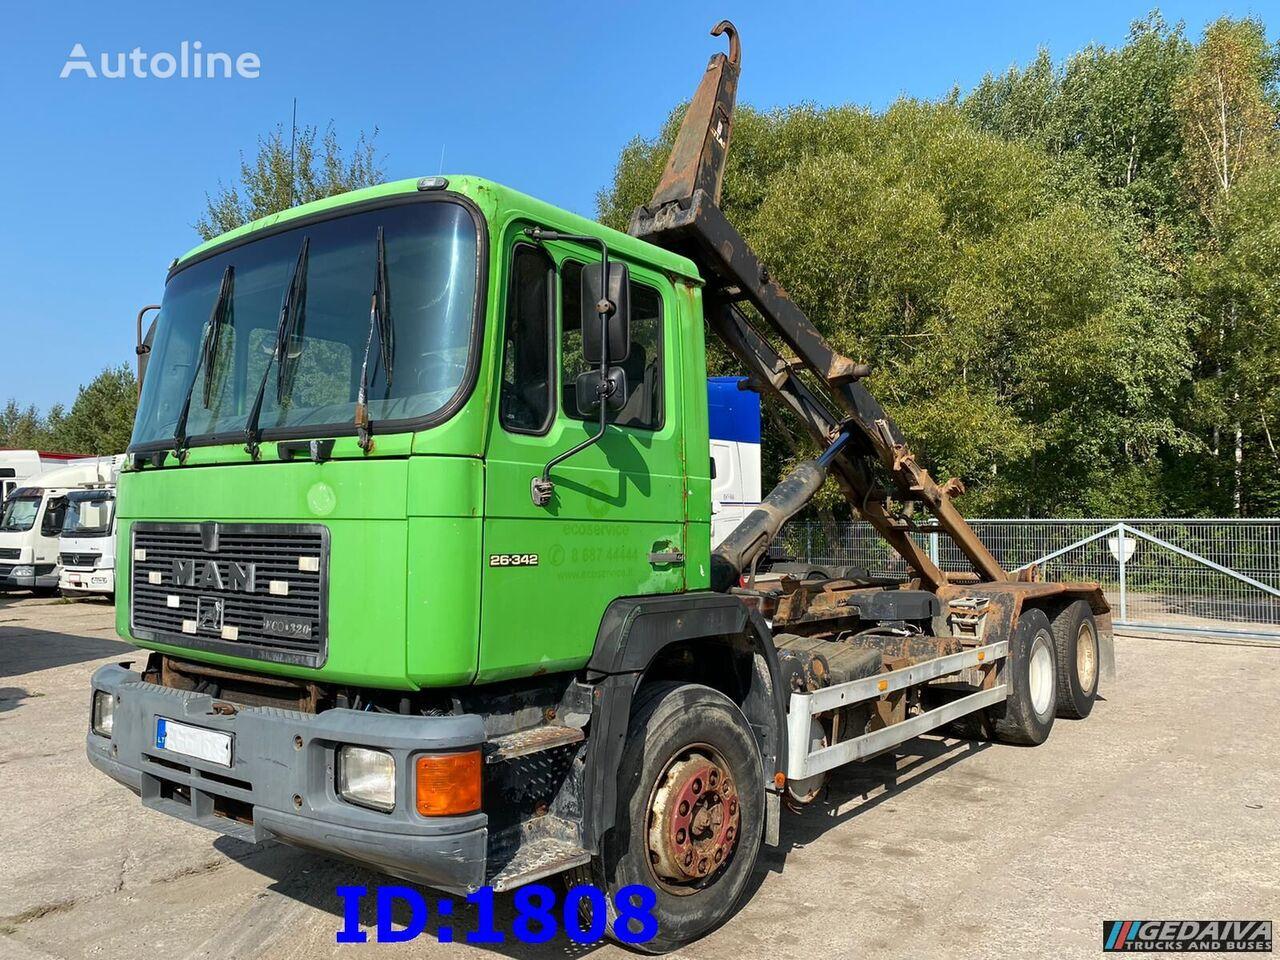 sunkvežimis su keliamuoju kabliu MAN 26.342 Hook tipper - 6x4 - 5cyl - Manual pump